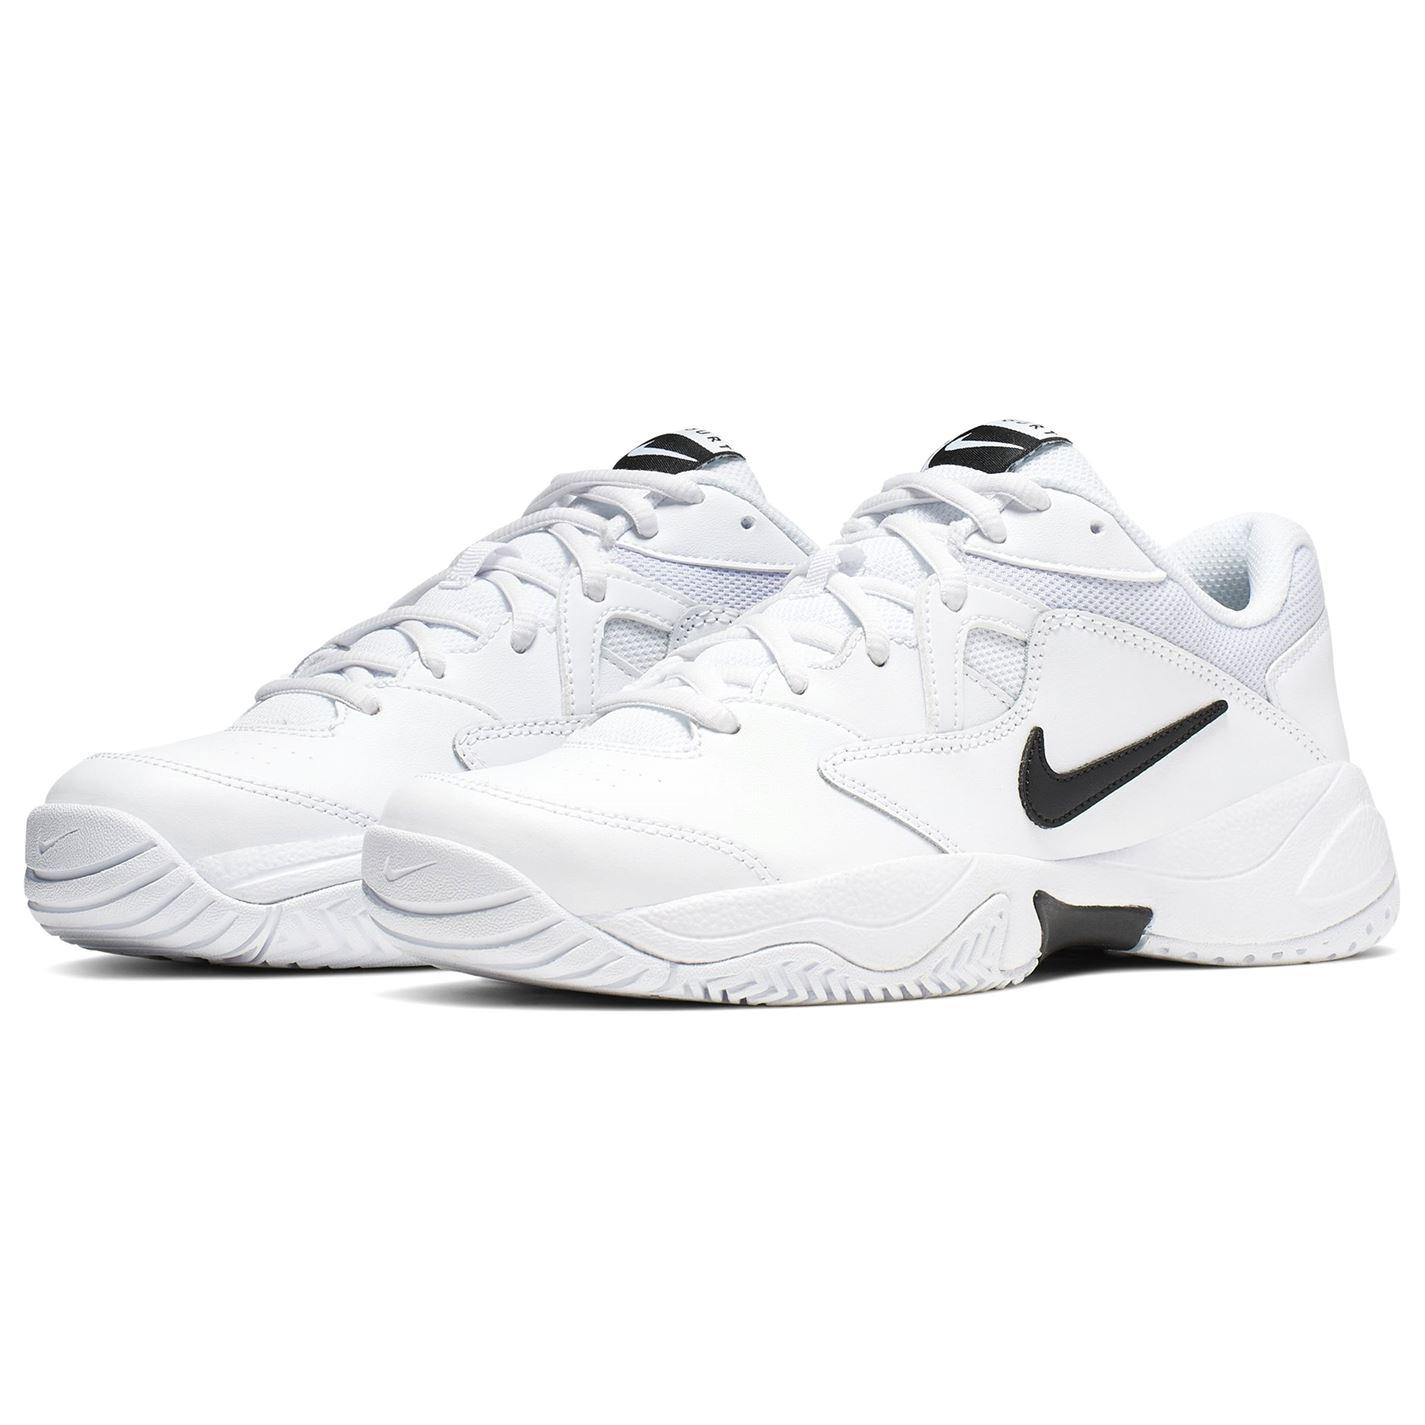 Cipők NIKE - Juvenate Se 862335 300 Dark Loden/Dark Loden - Sneakers - Félcipő - Női